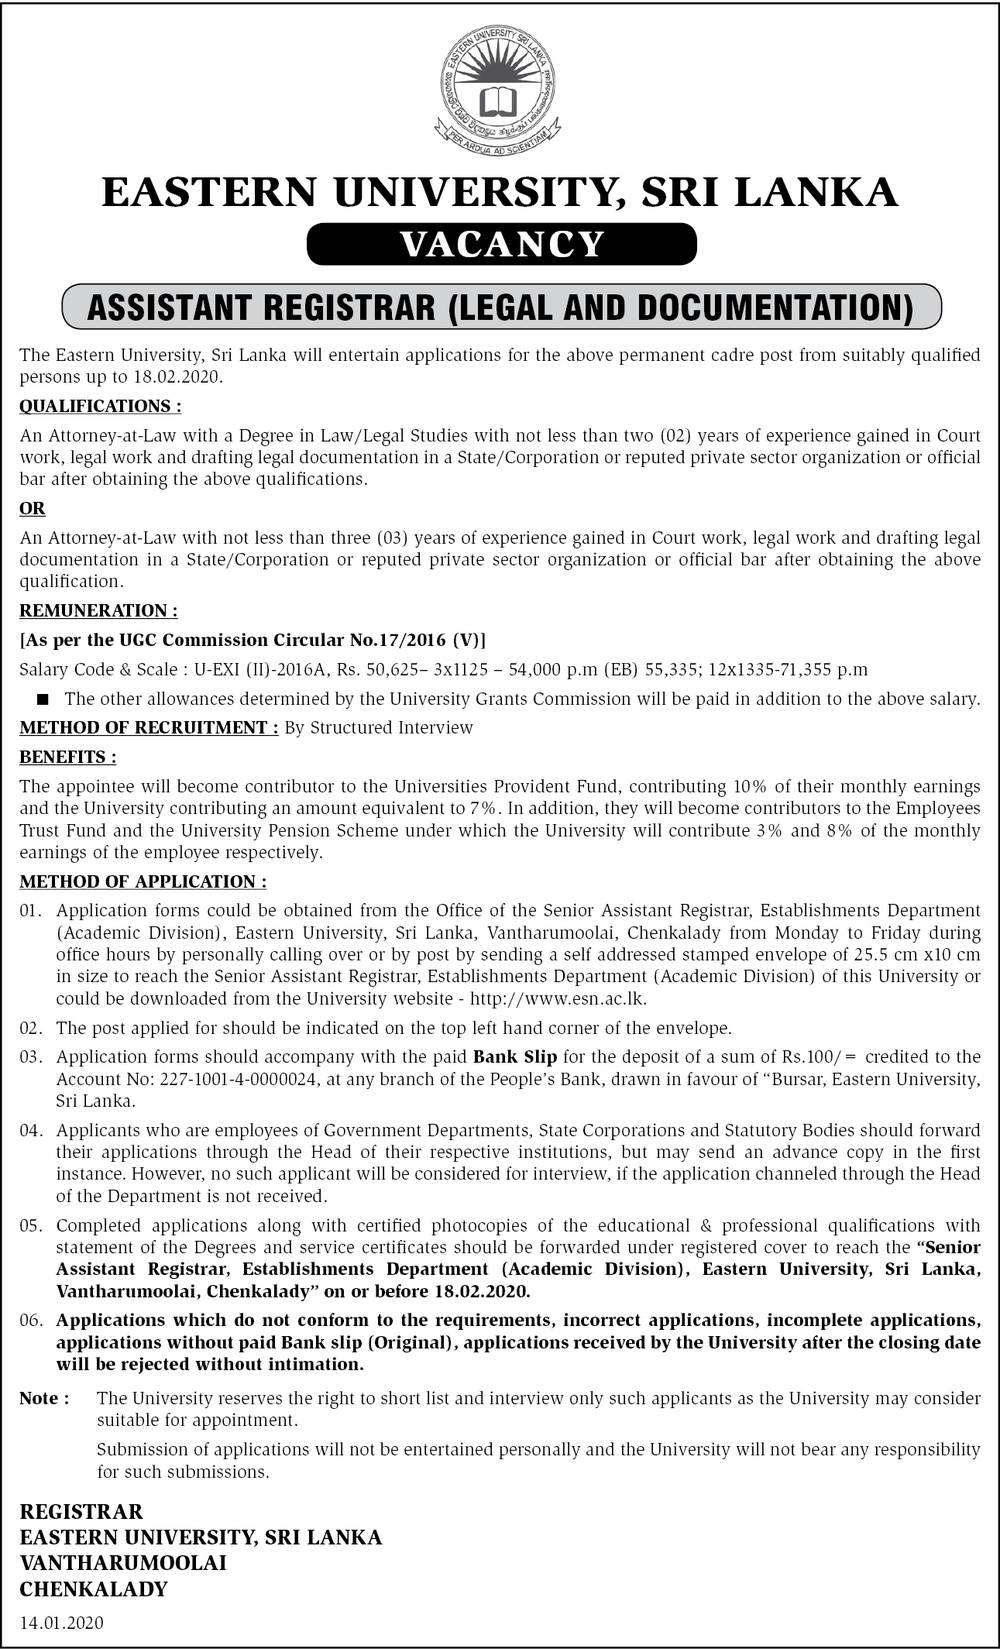 Assistant Registrar (Legal & Documentation) - Eastern University, Sri Lanka